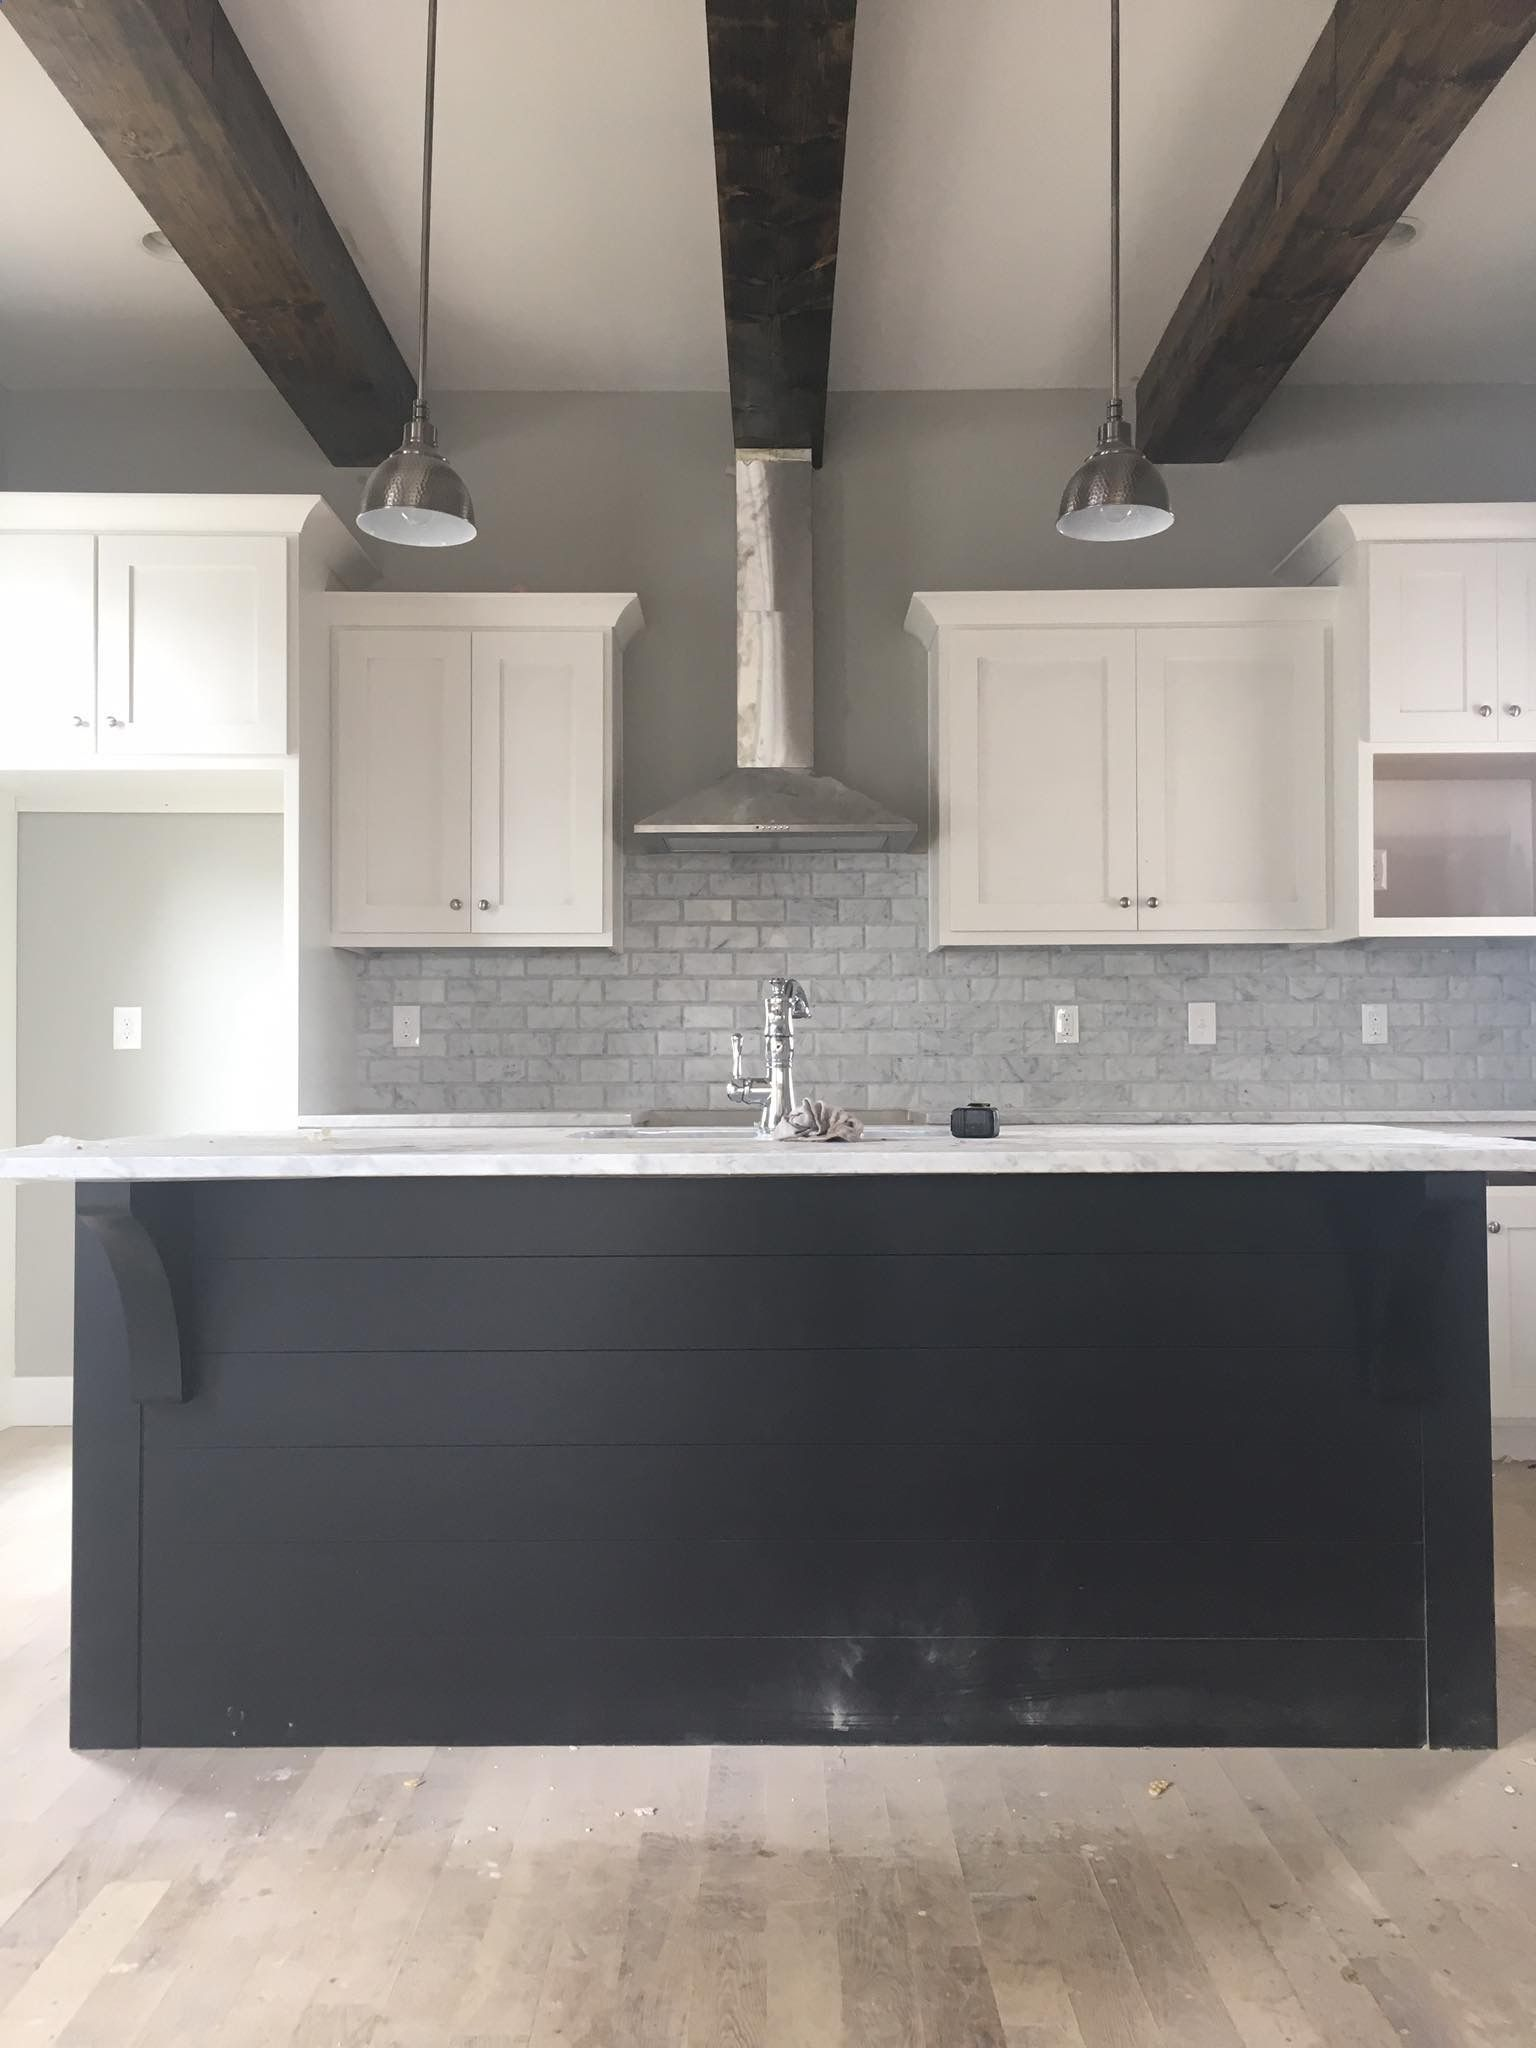 East Nashville classic modern craftsman kitchen Wood